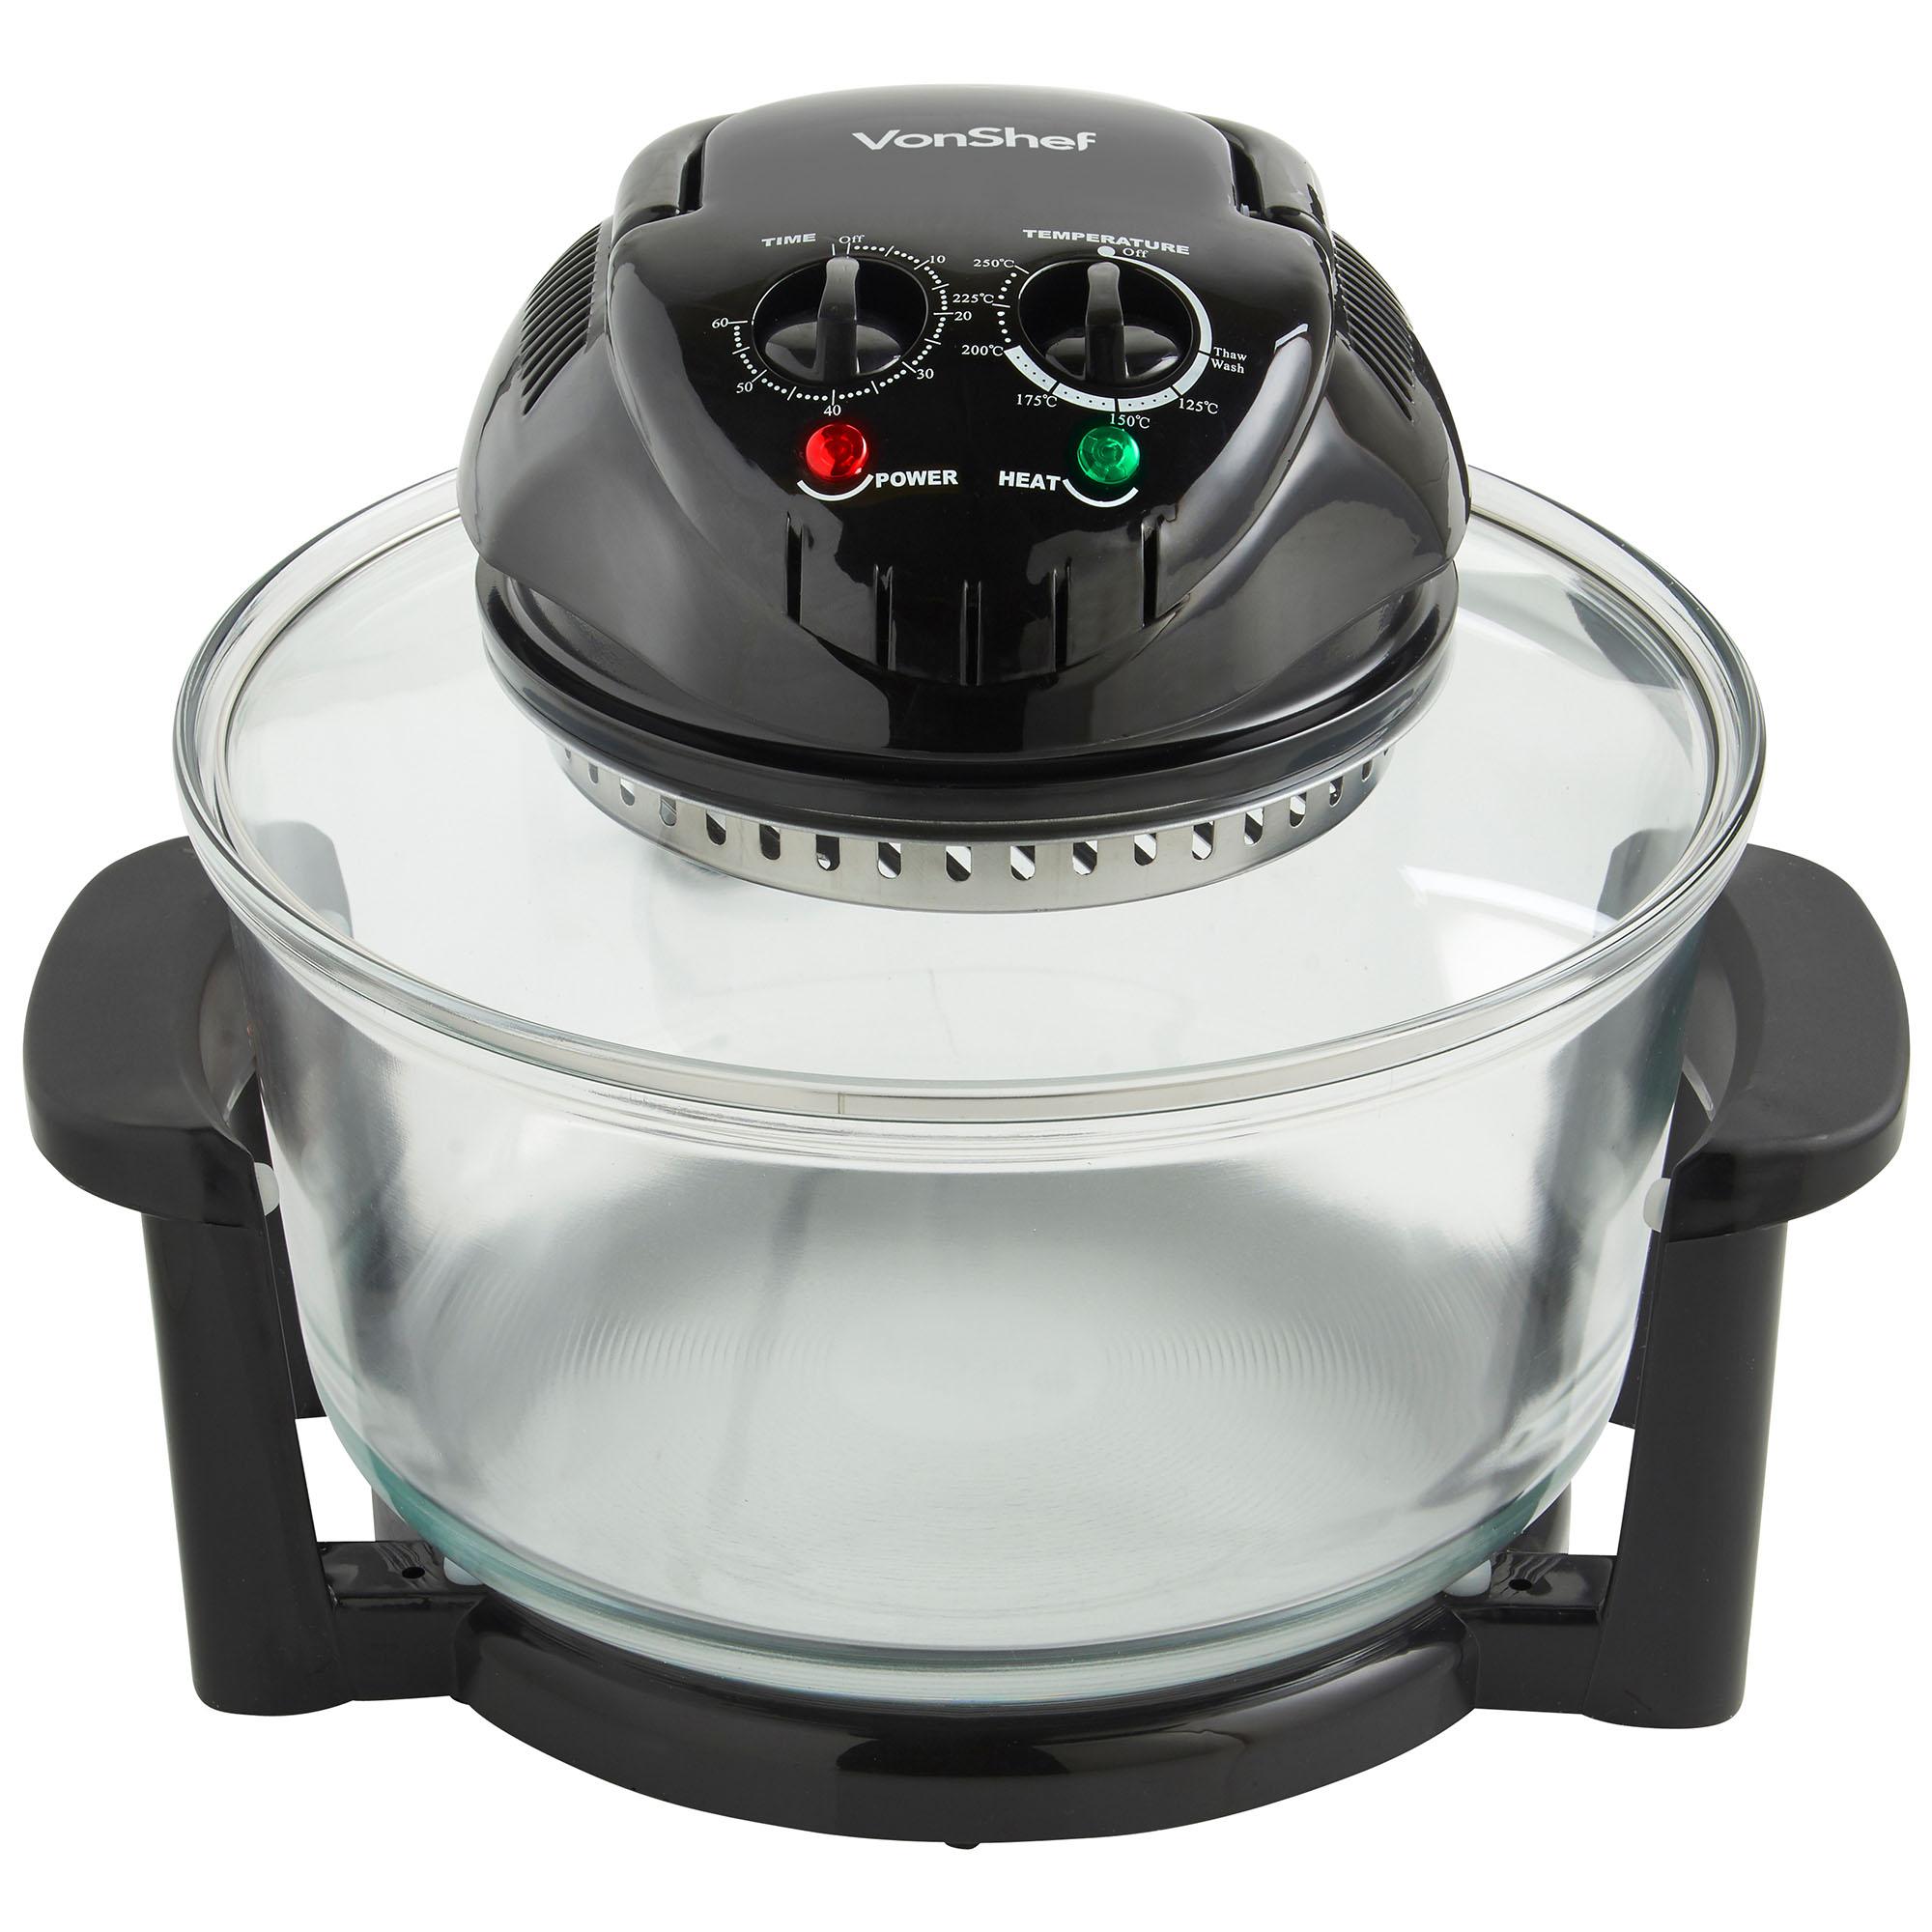 Vonshef Halogen Oven Convection Cooker Air Fryer